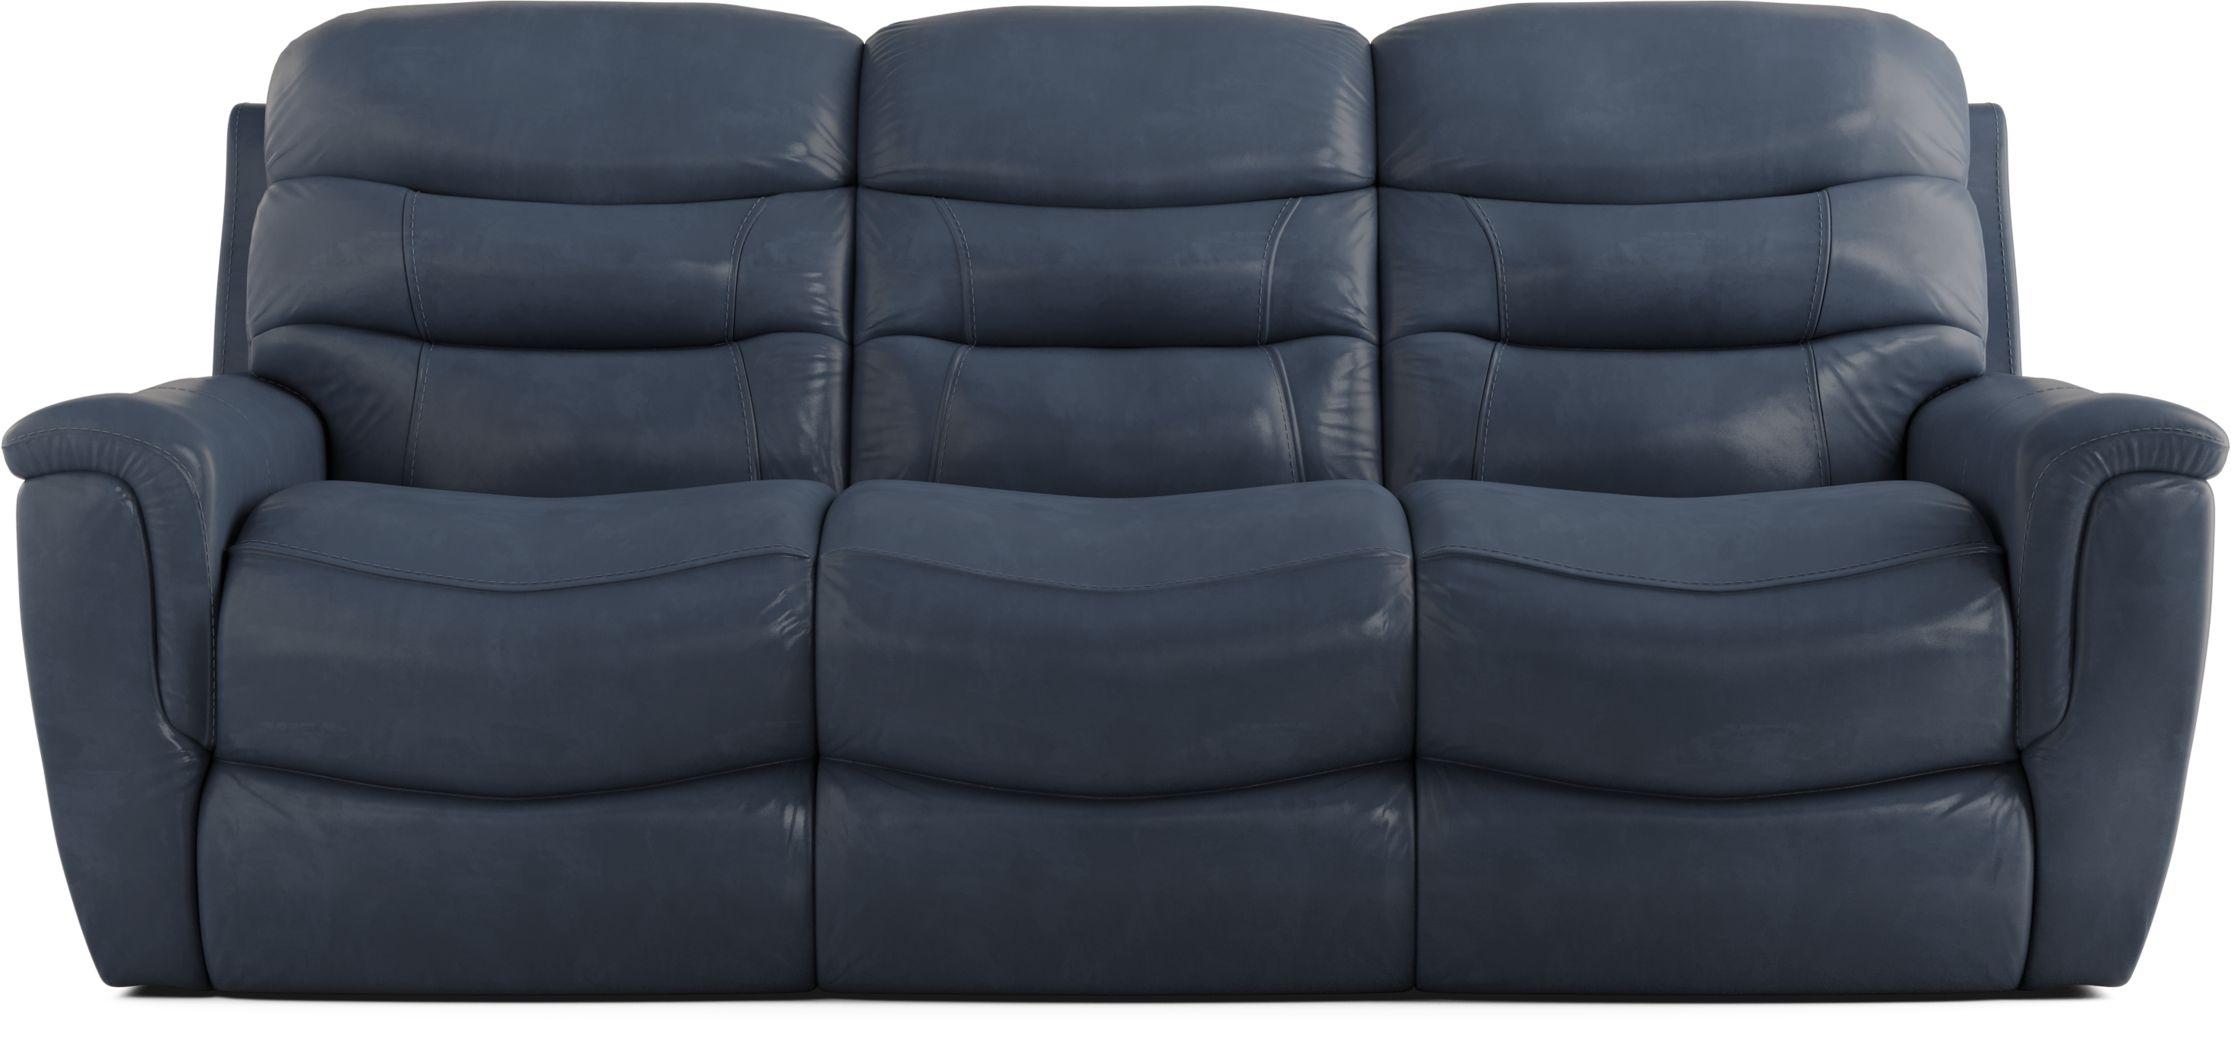 Sabella Navy Leather Power Reclining Sofa